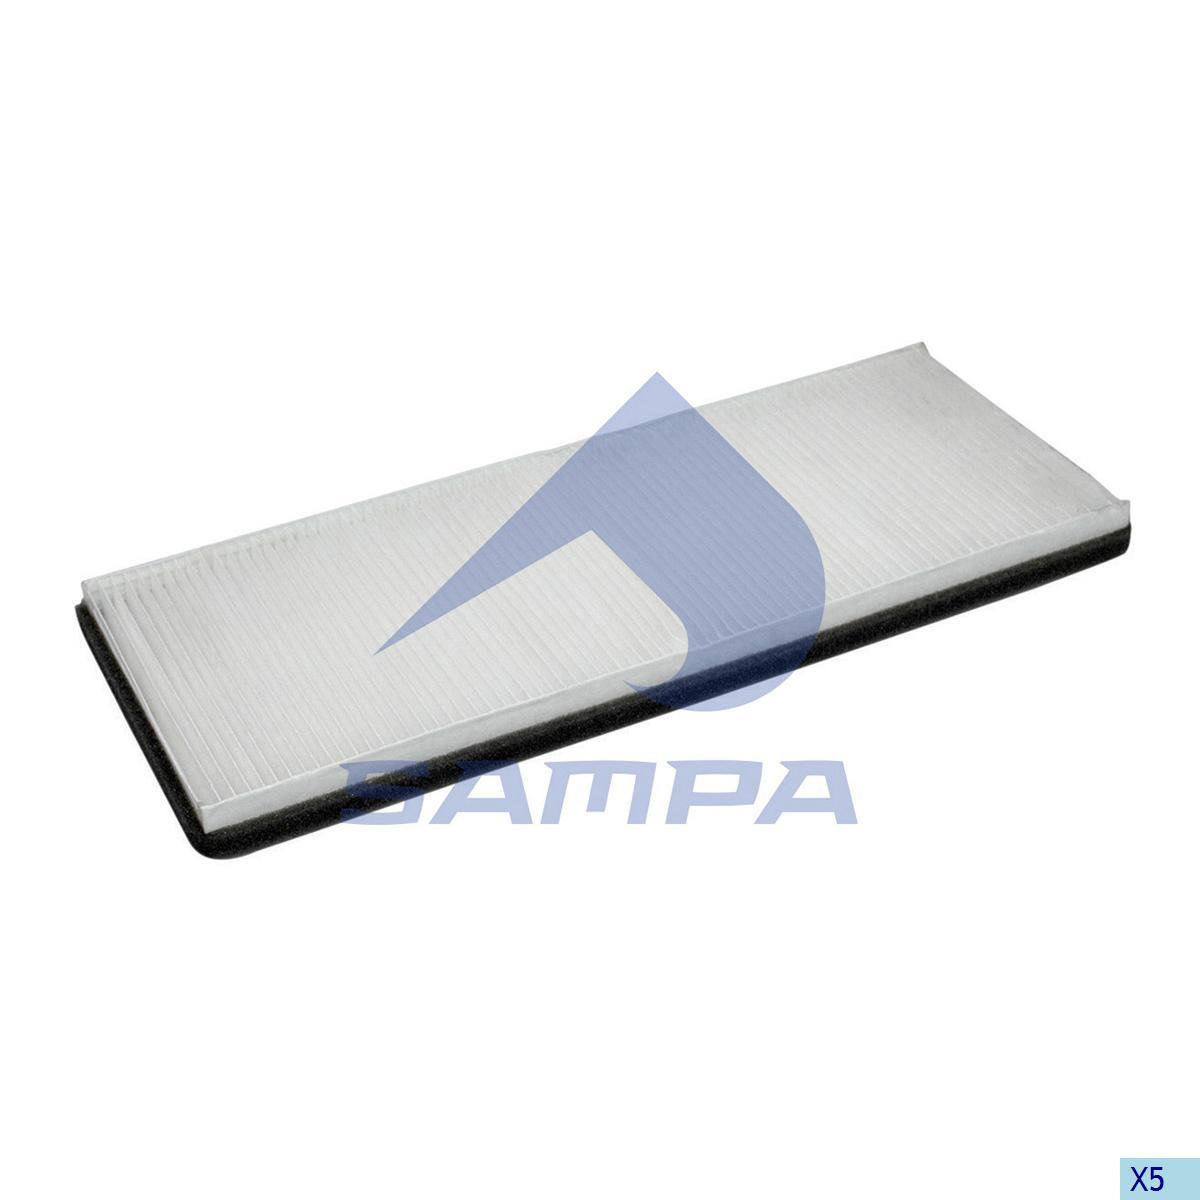 Filter, Cab Heating & Ventilation, Daf, Cab